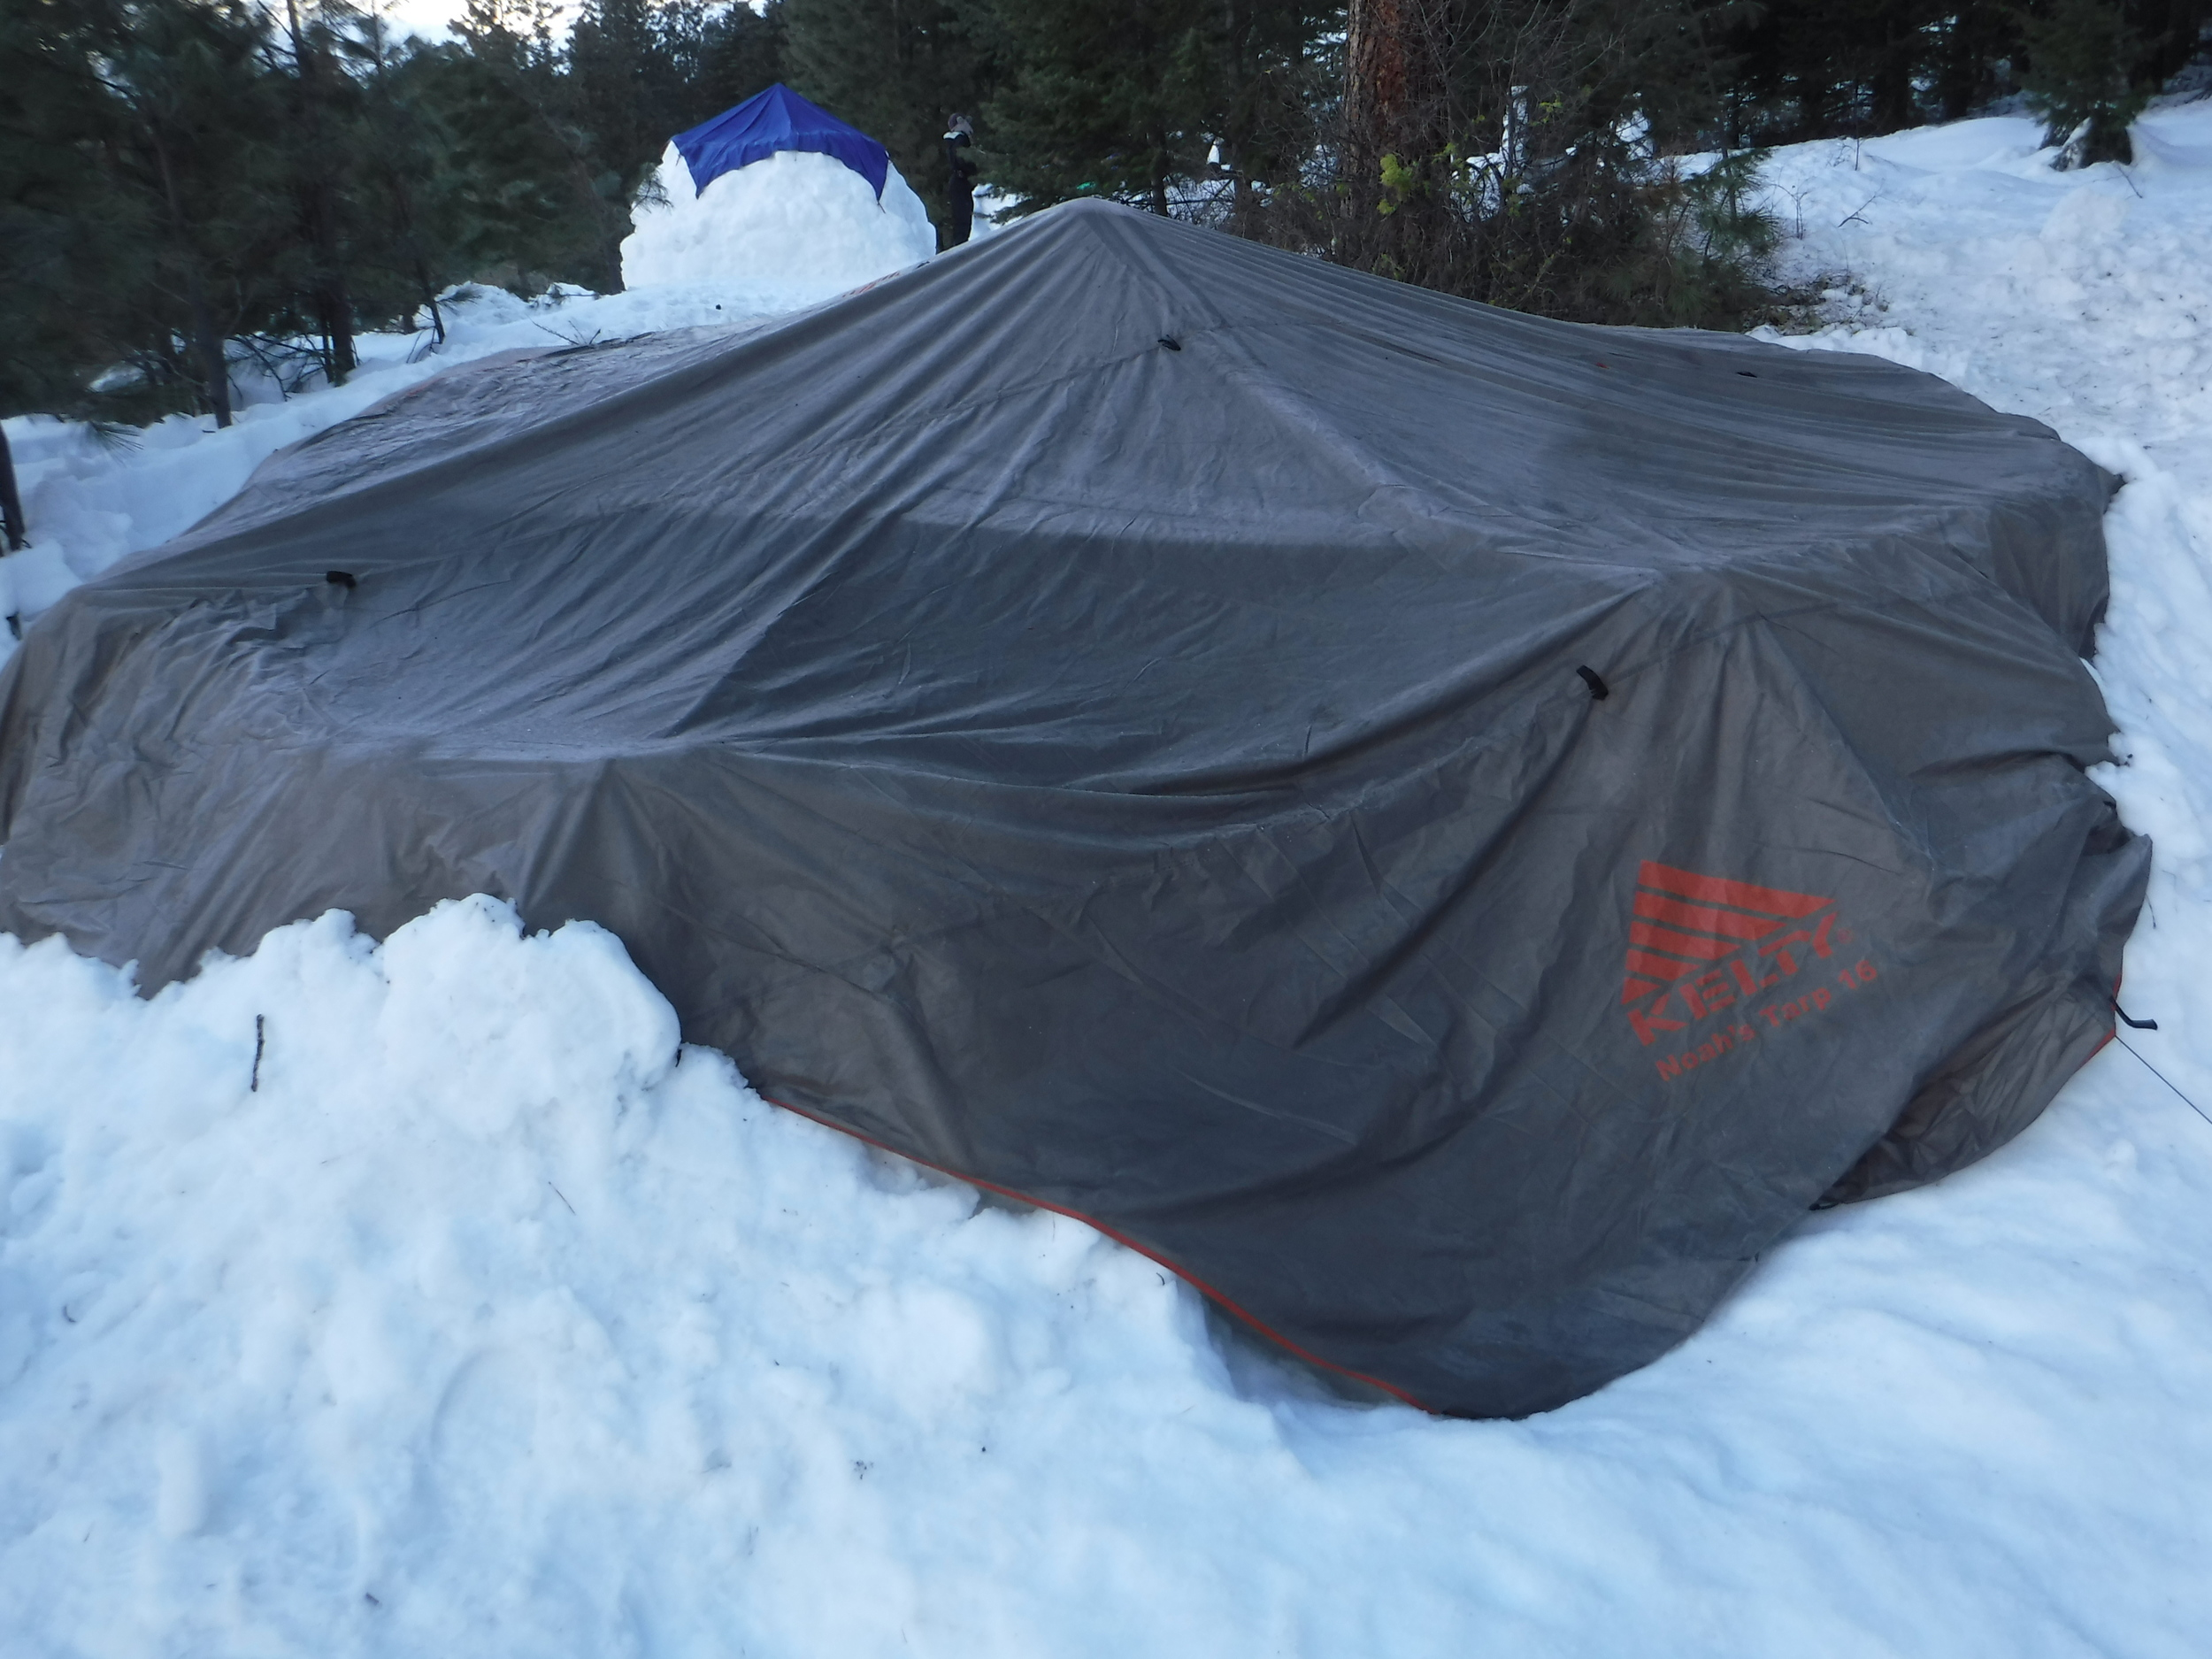 Kelty Tarp shelter. Room for six.